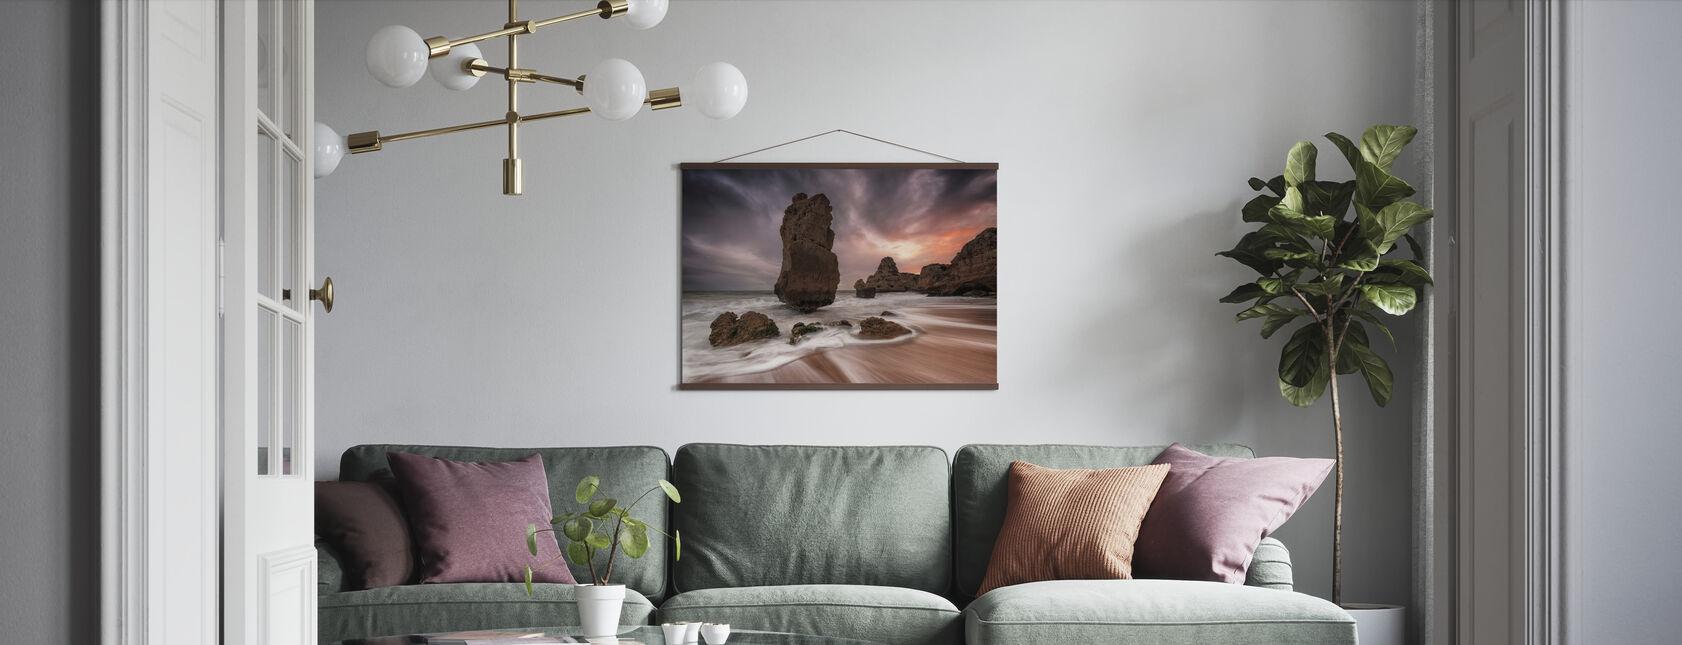 Totem - Poster - Living Room